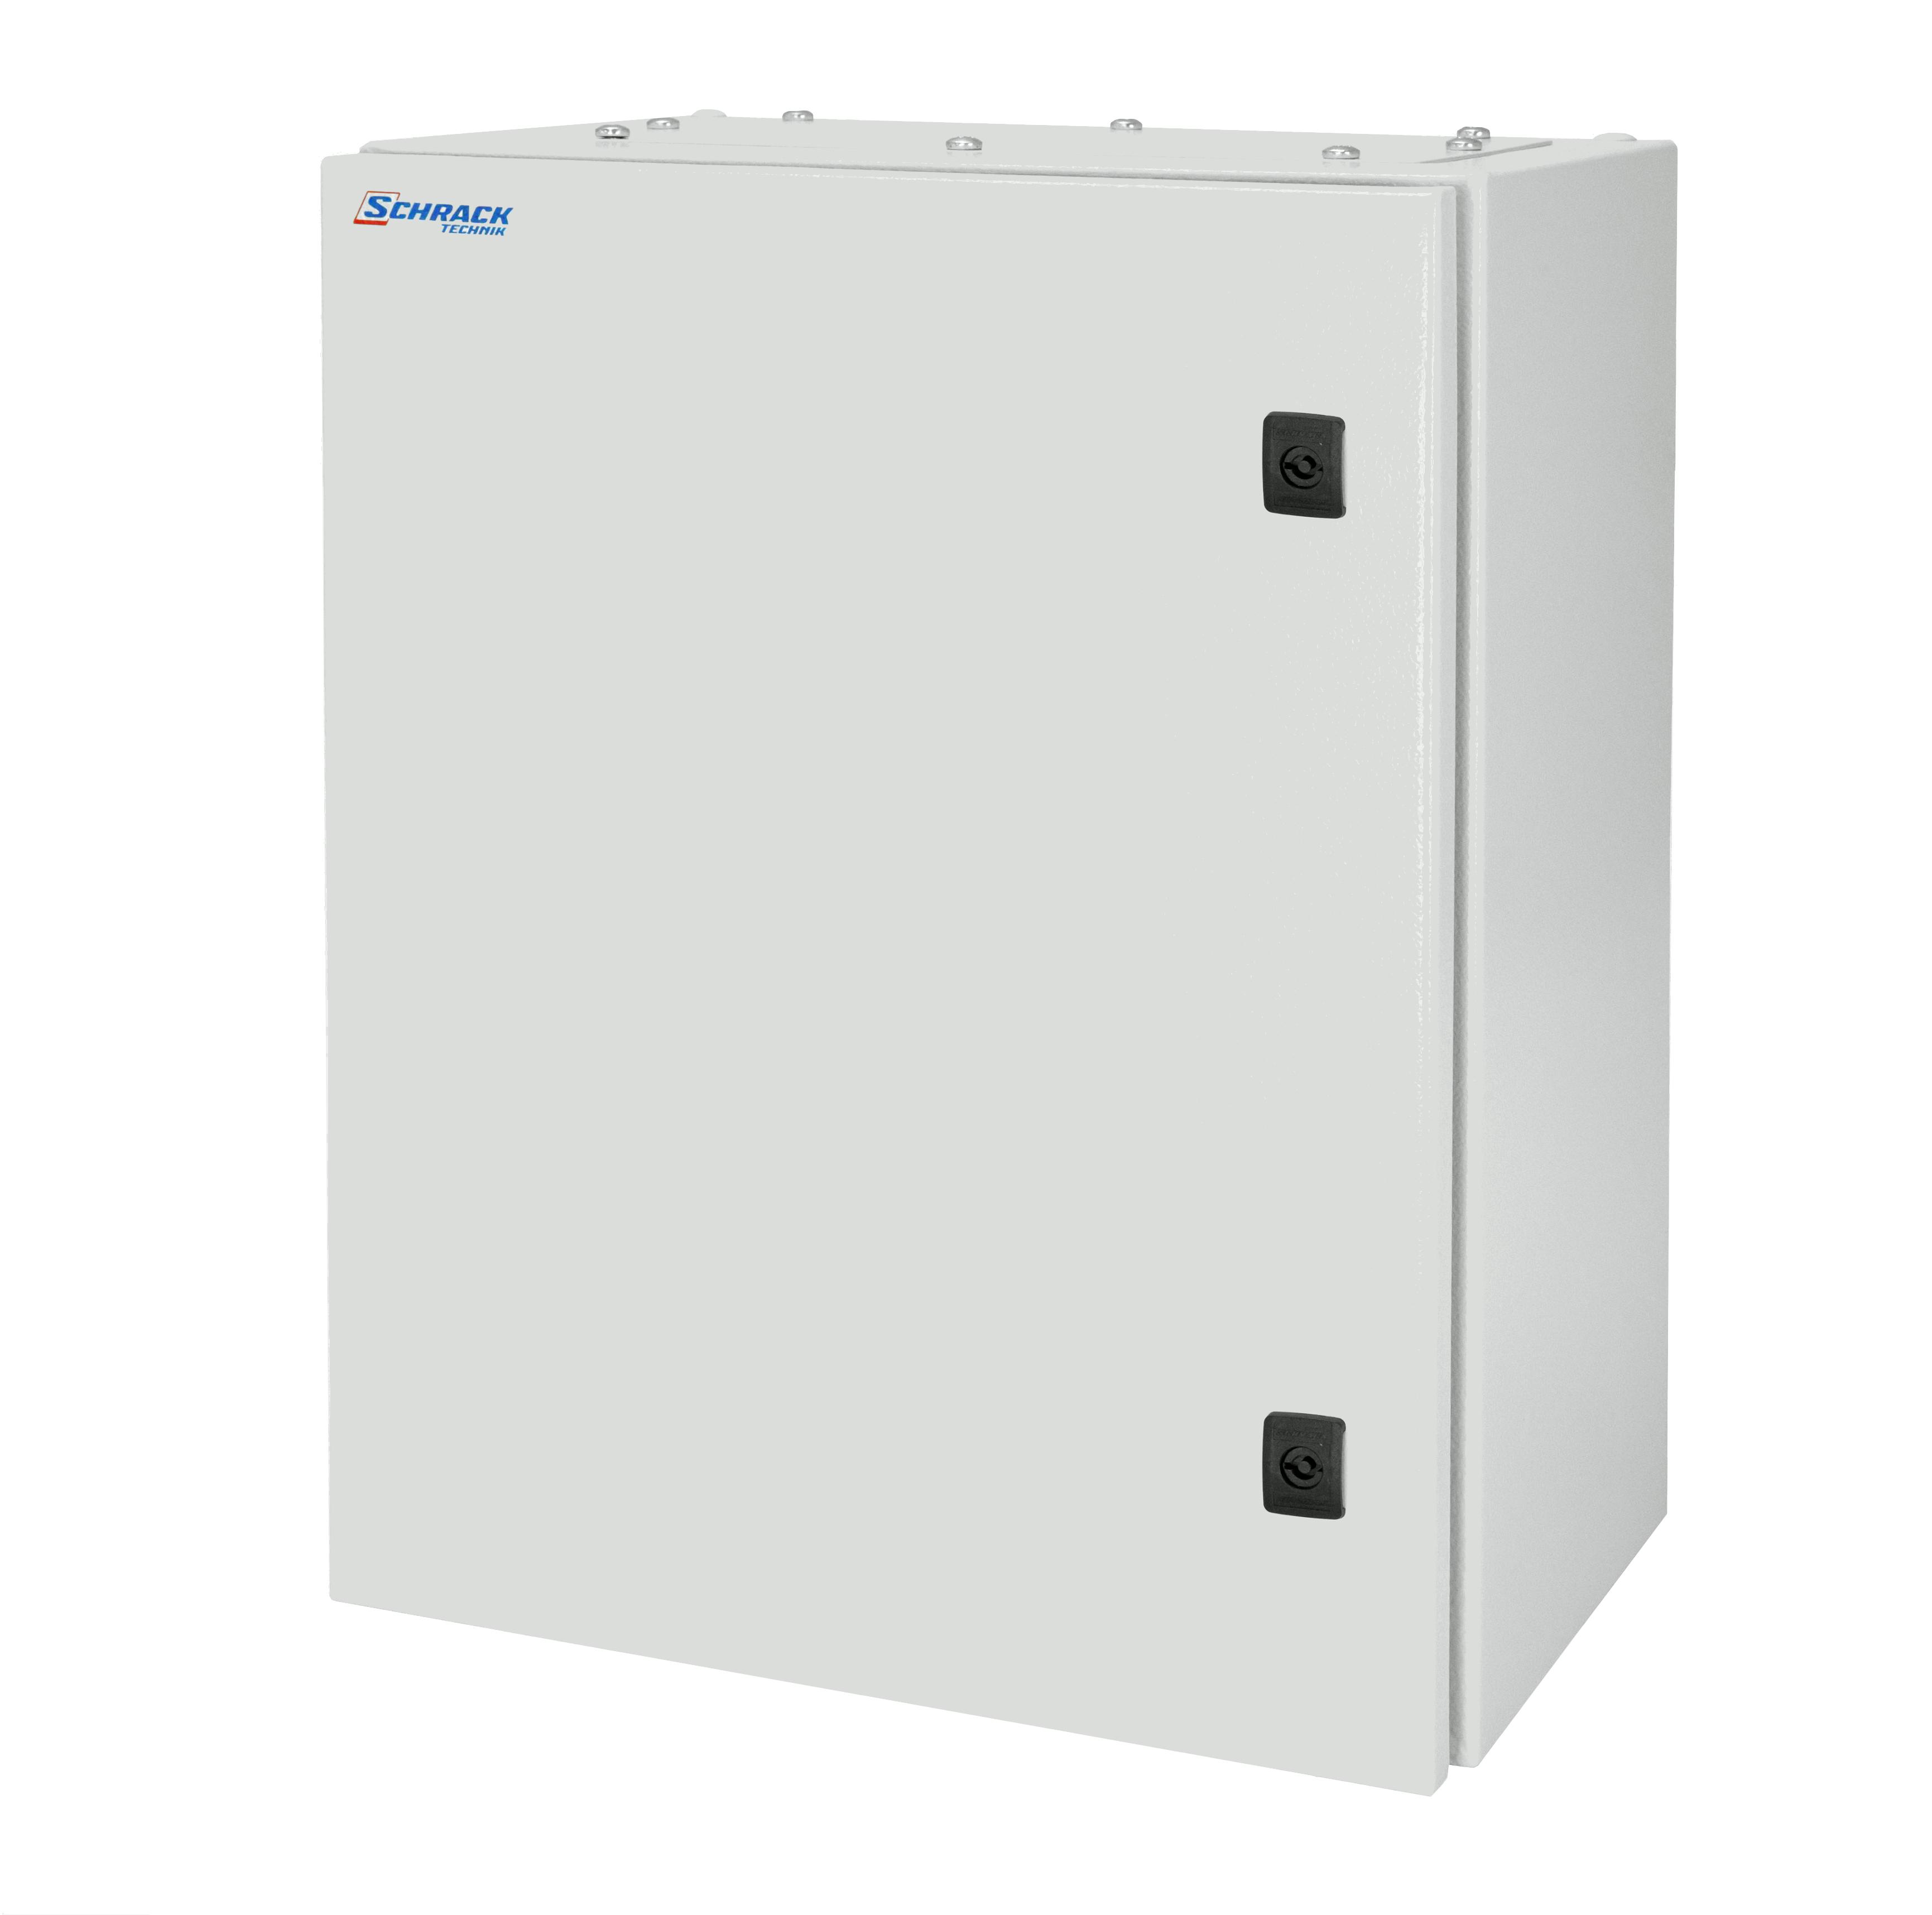 1 Stk Wandschrank Mono IP66 H=800 B=400 T=300 Stahlblech WSM8040300